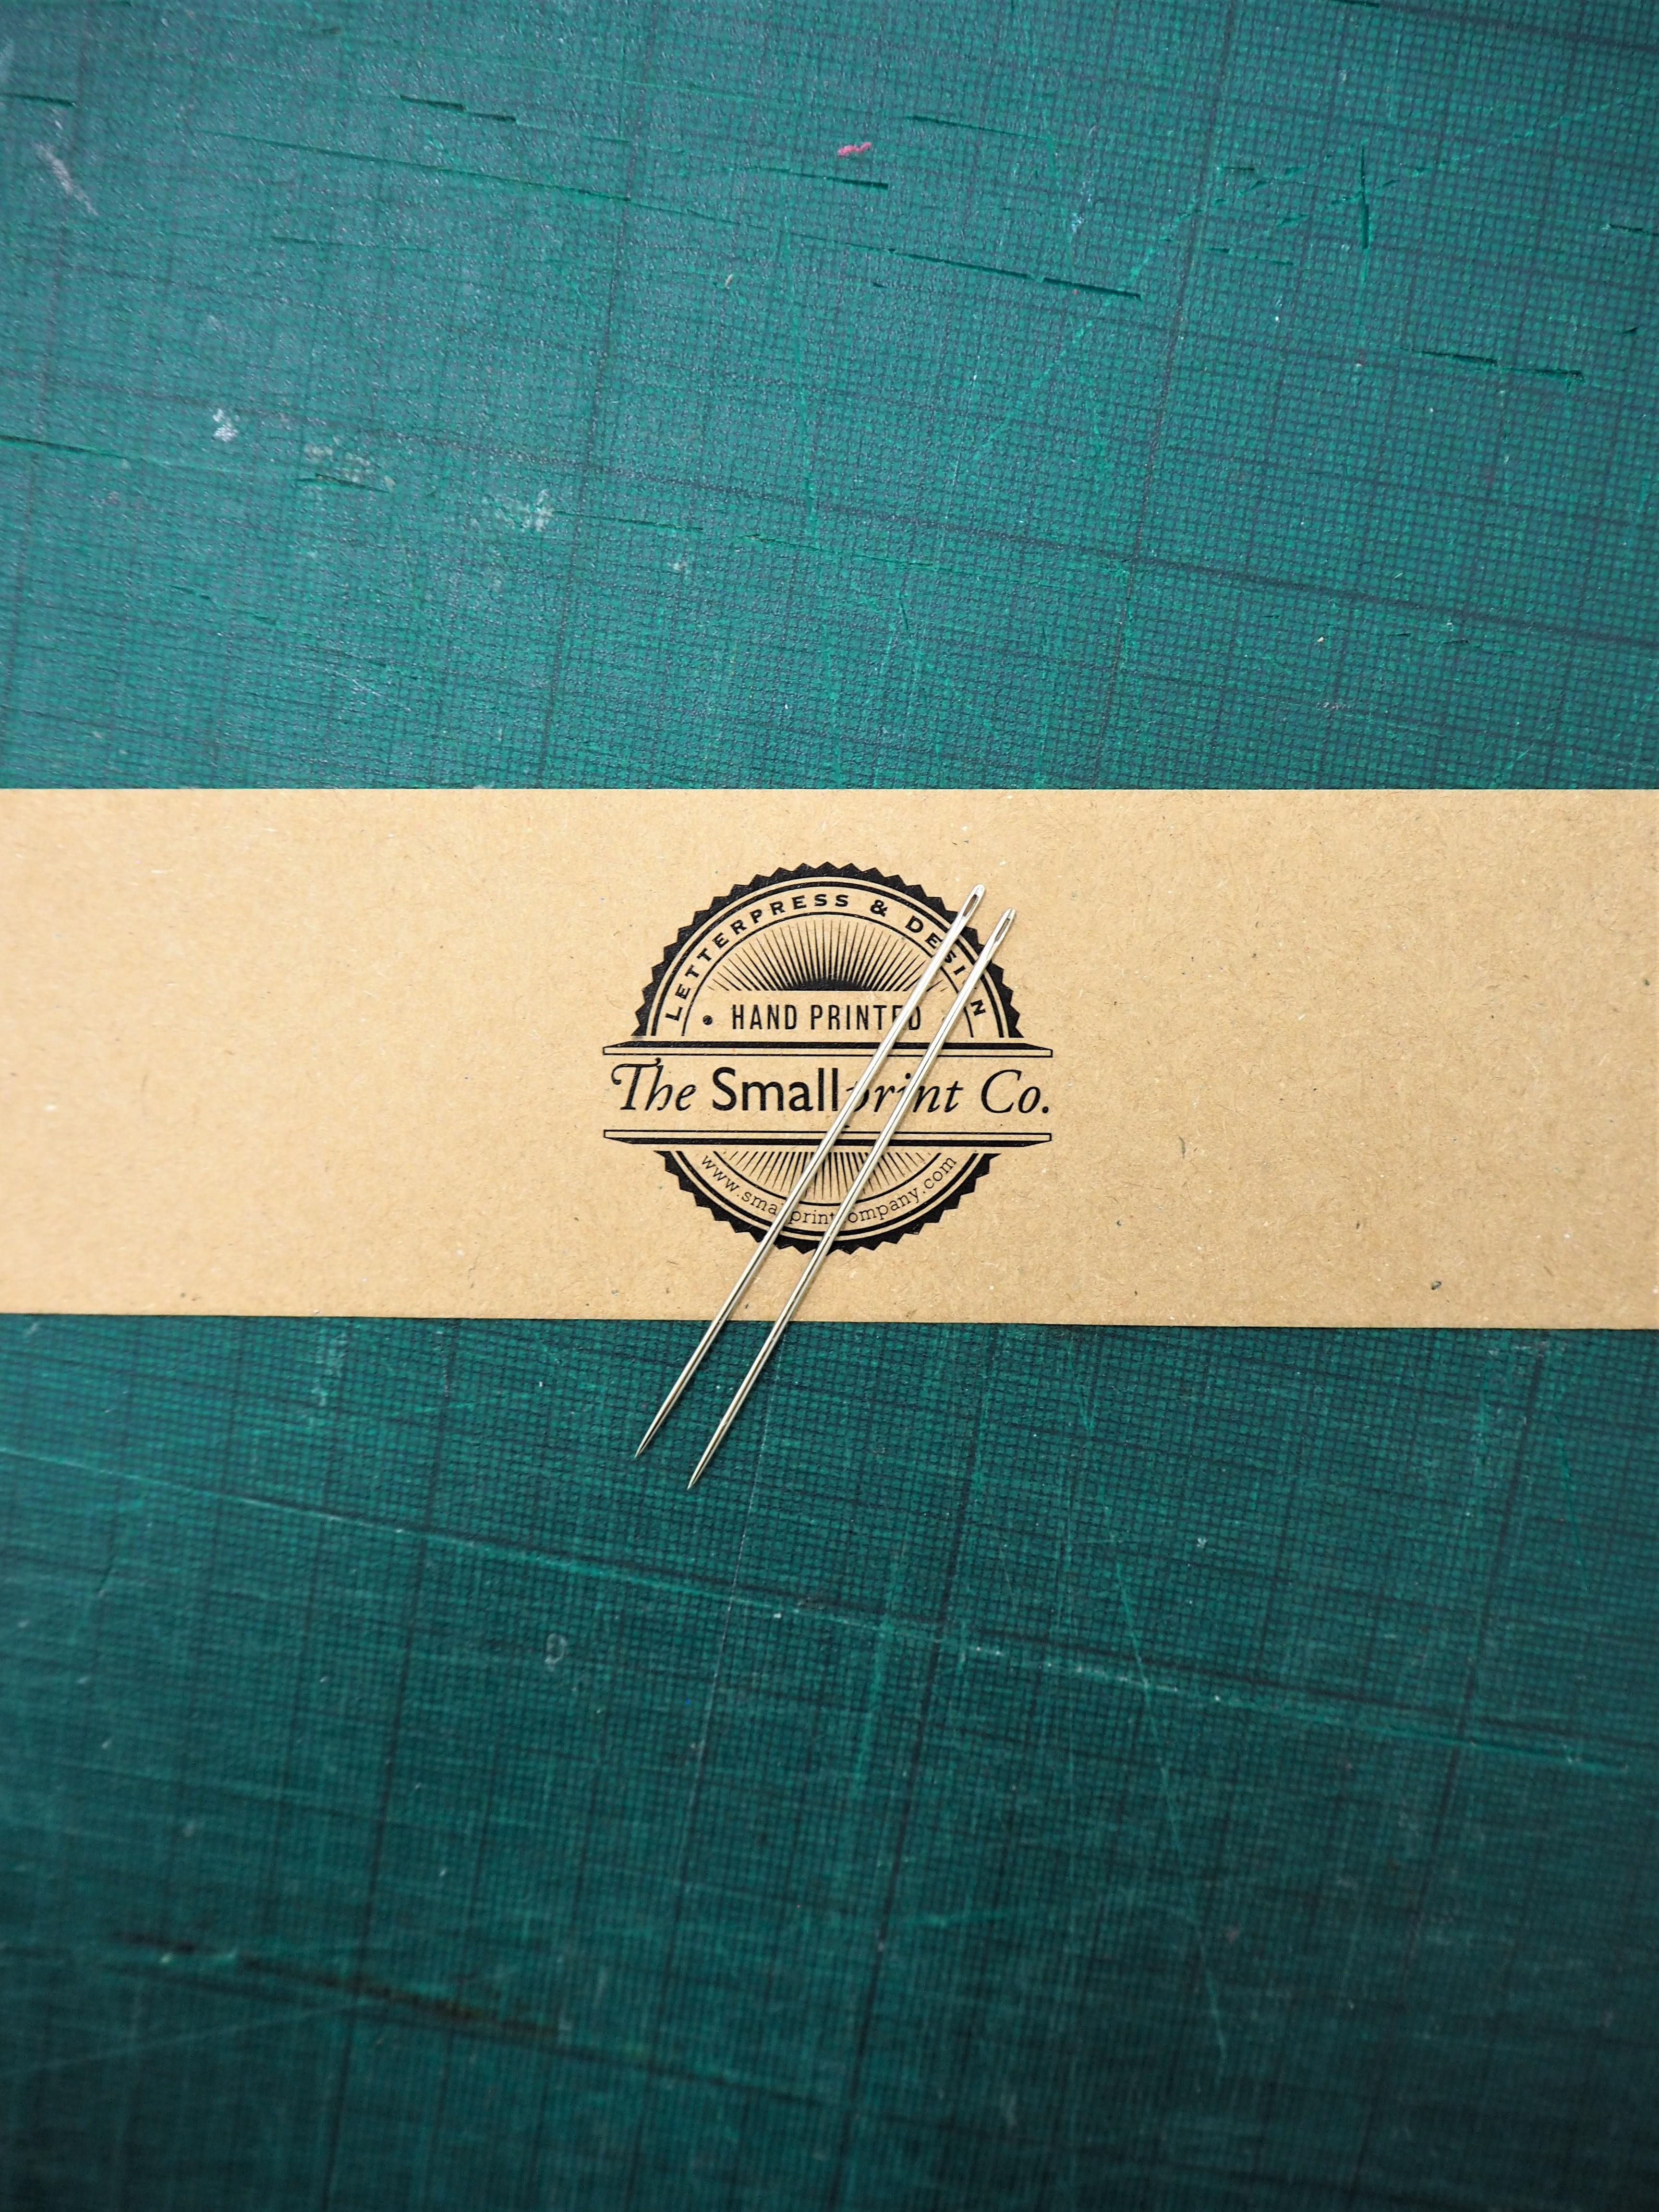 Straight Bookbinding Needles